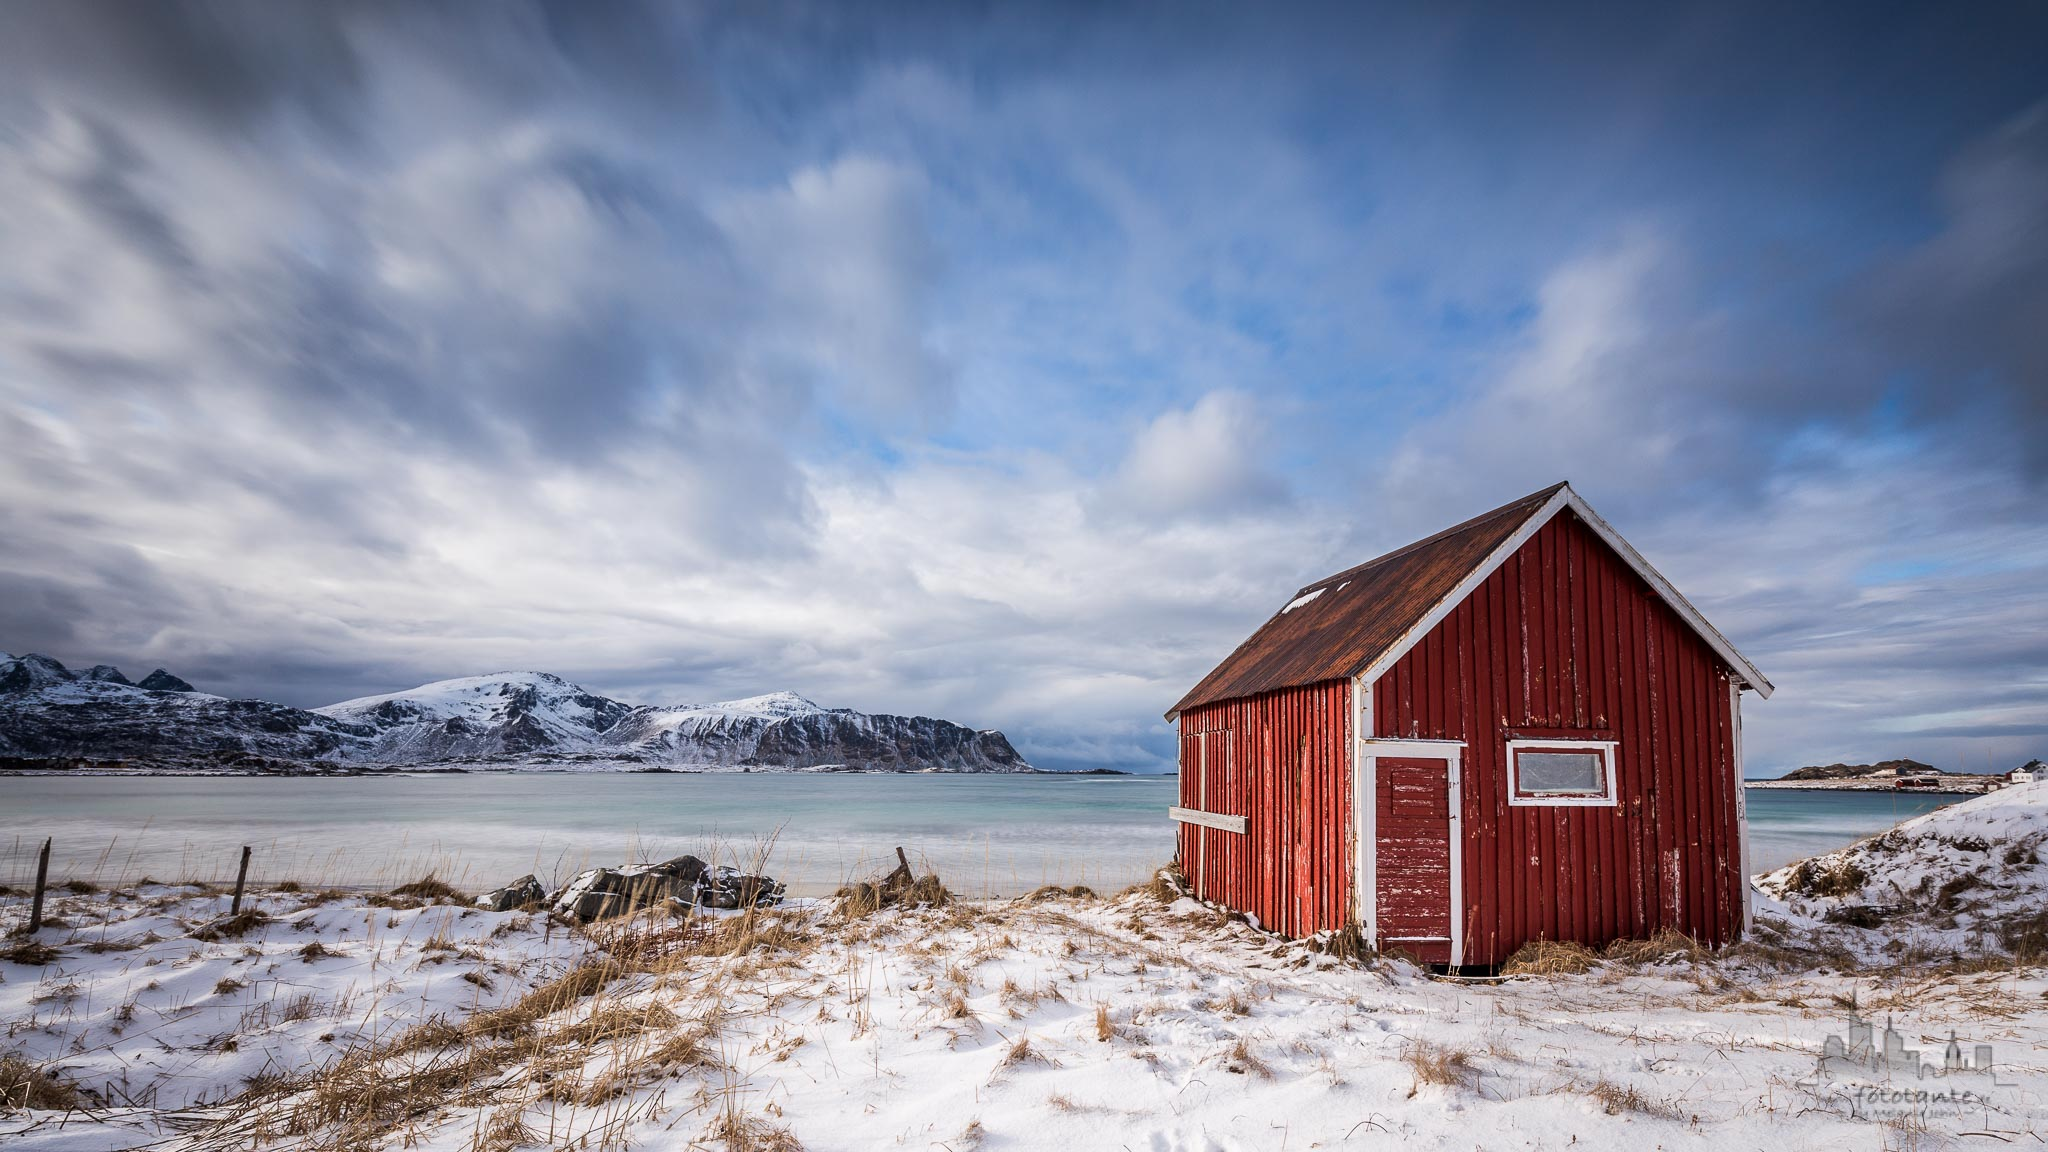 Red hut at Ramberg beach, Lofoten, Norway